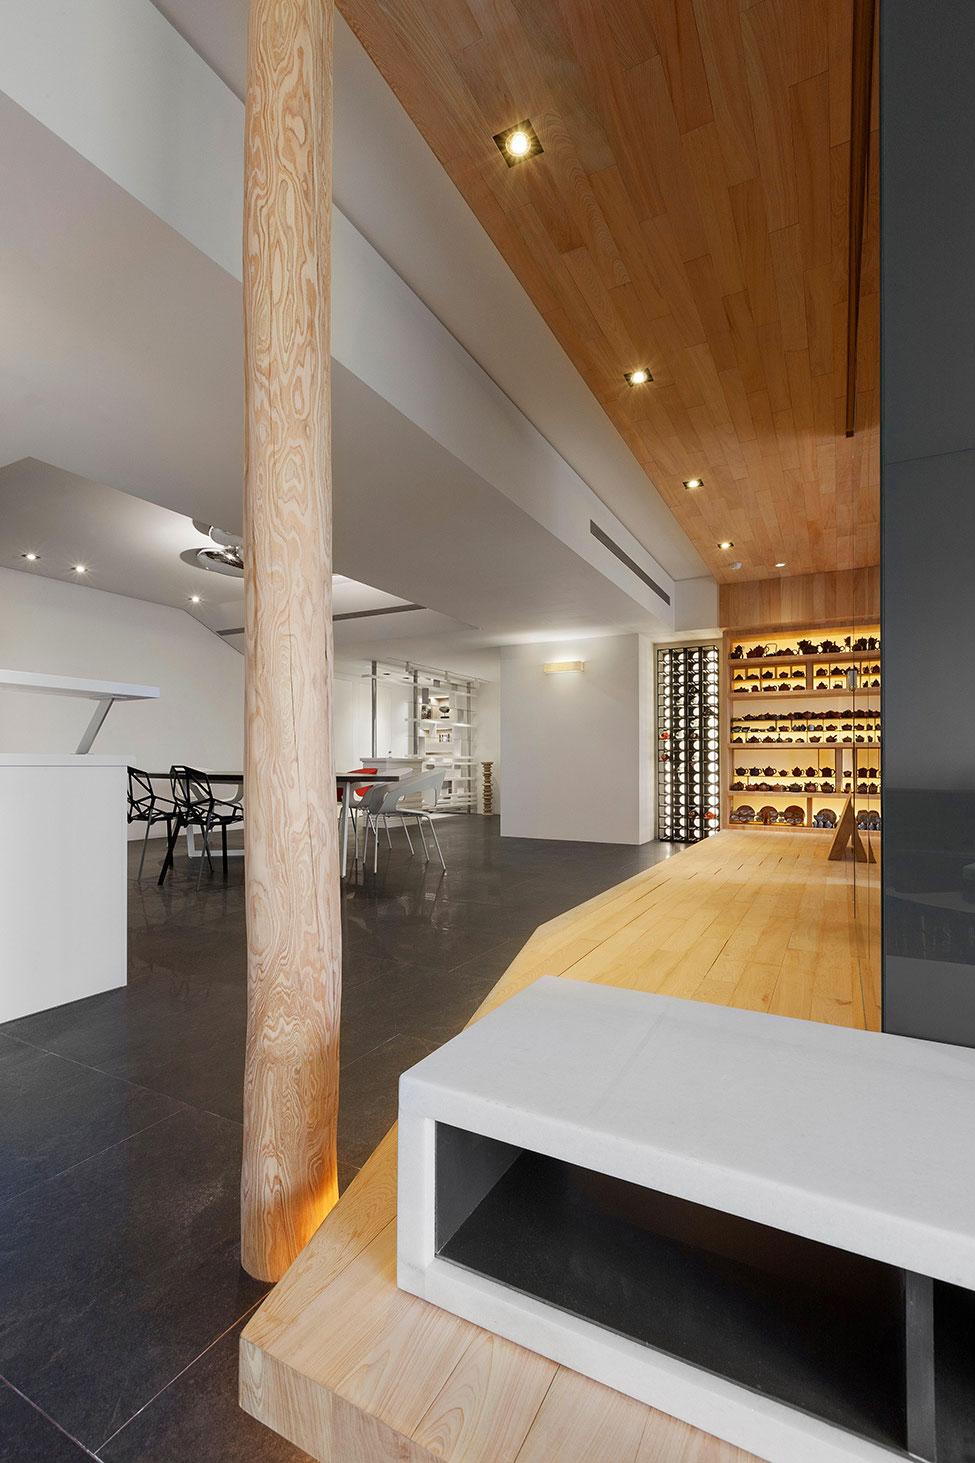 Lägenhet-omdesignad-med-ett-stort-öppet-utrymme-9 Lägenhet omdesignat med ett stort öppet utrymme av JC Architecture